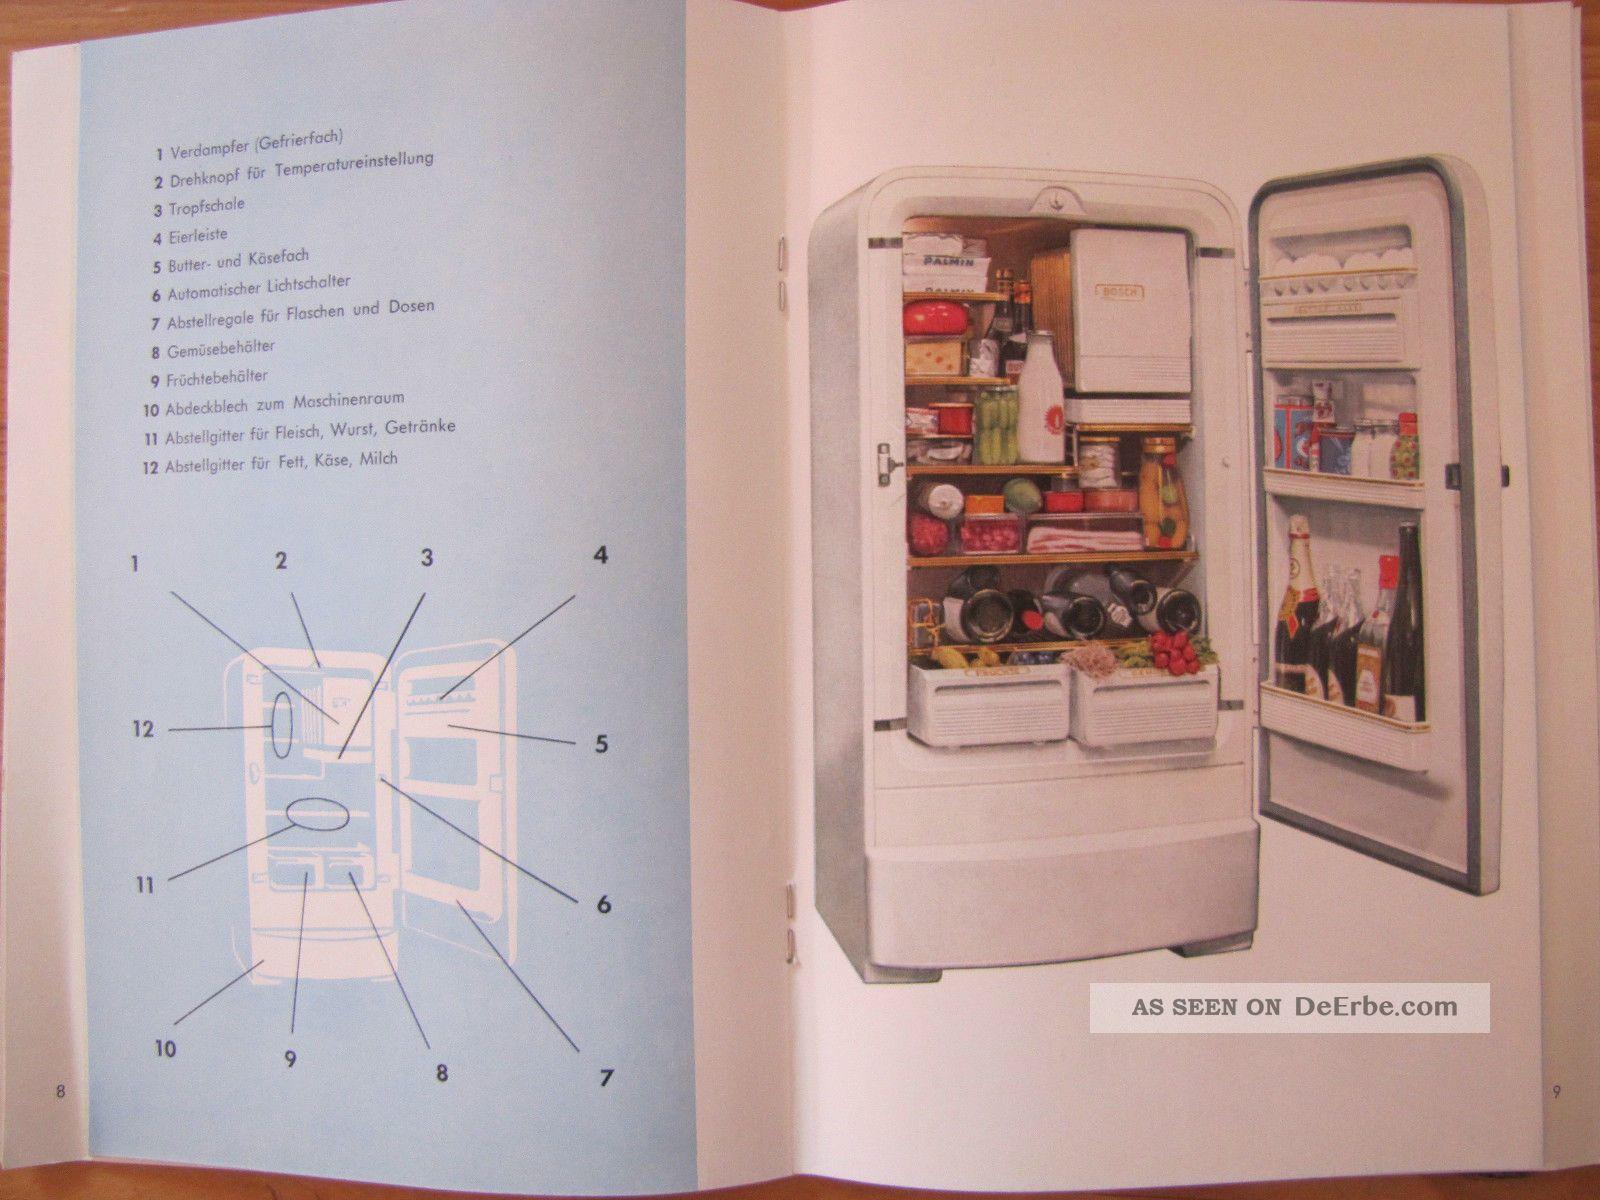 Bosch Kühlschrank Classic Edition Bedienungsanleitung : Bosch retro kühlschrank anleitung: bosch kühlschrank alarm